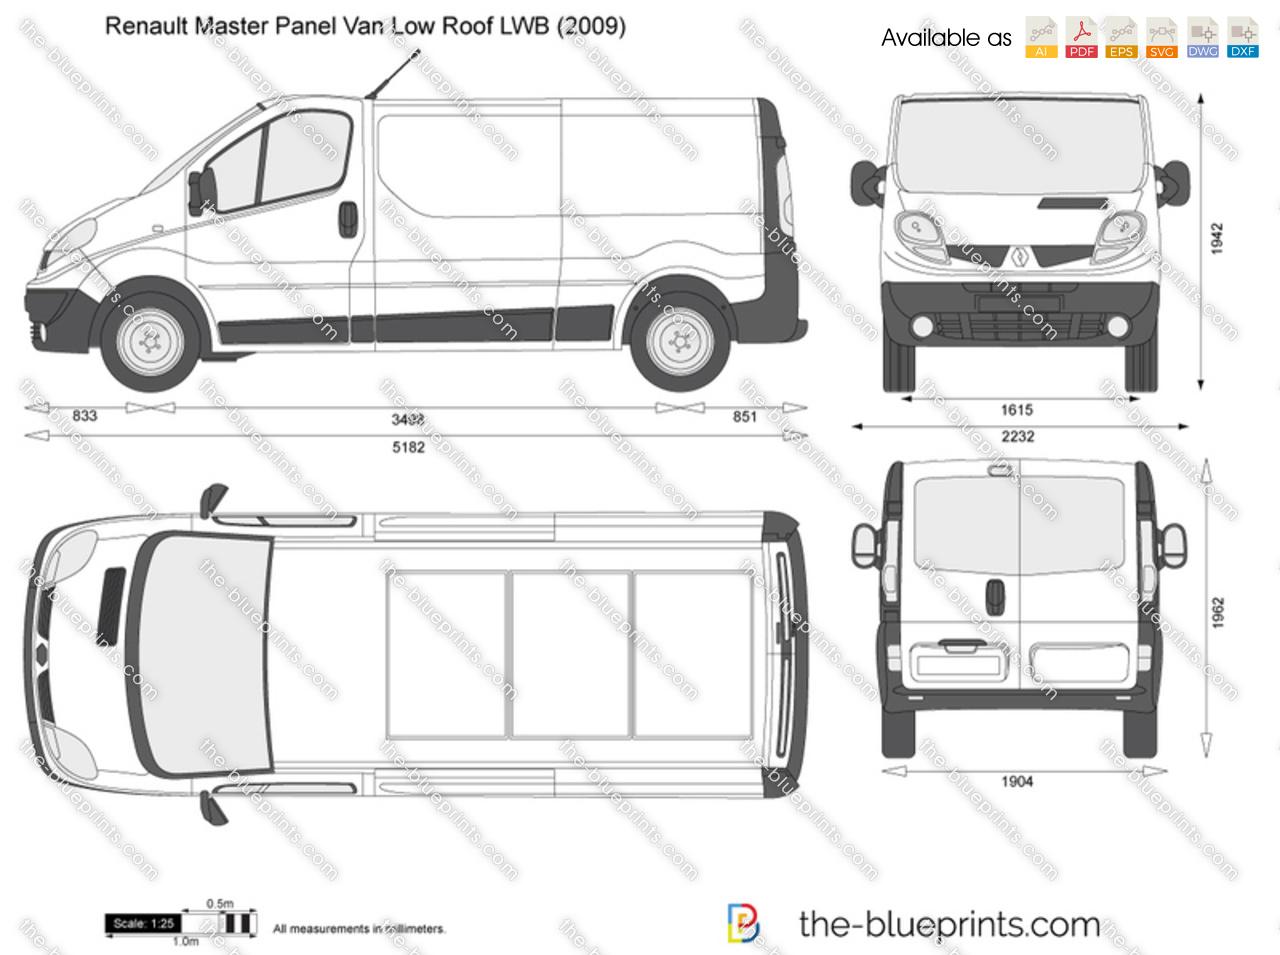 Renault trafic lwb dimensions